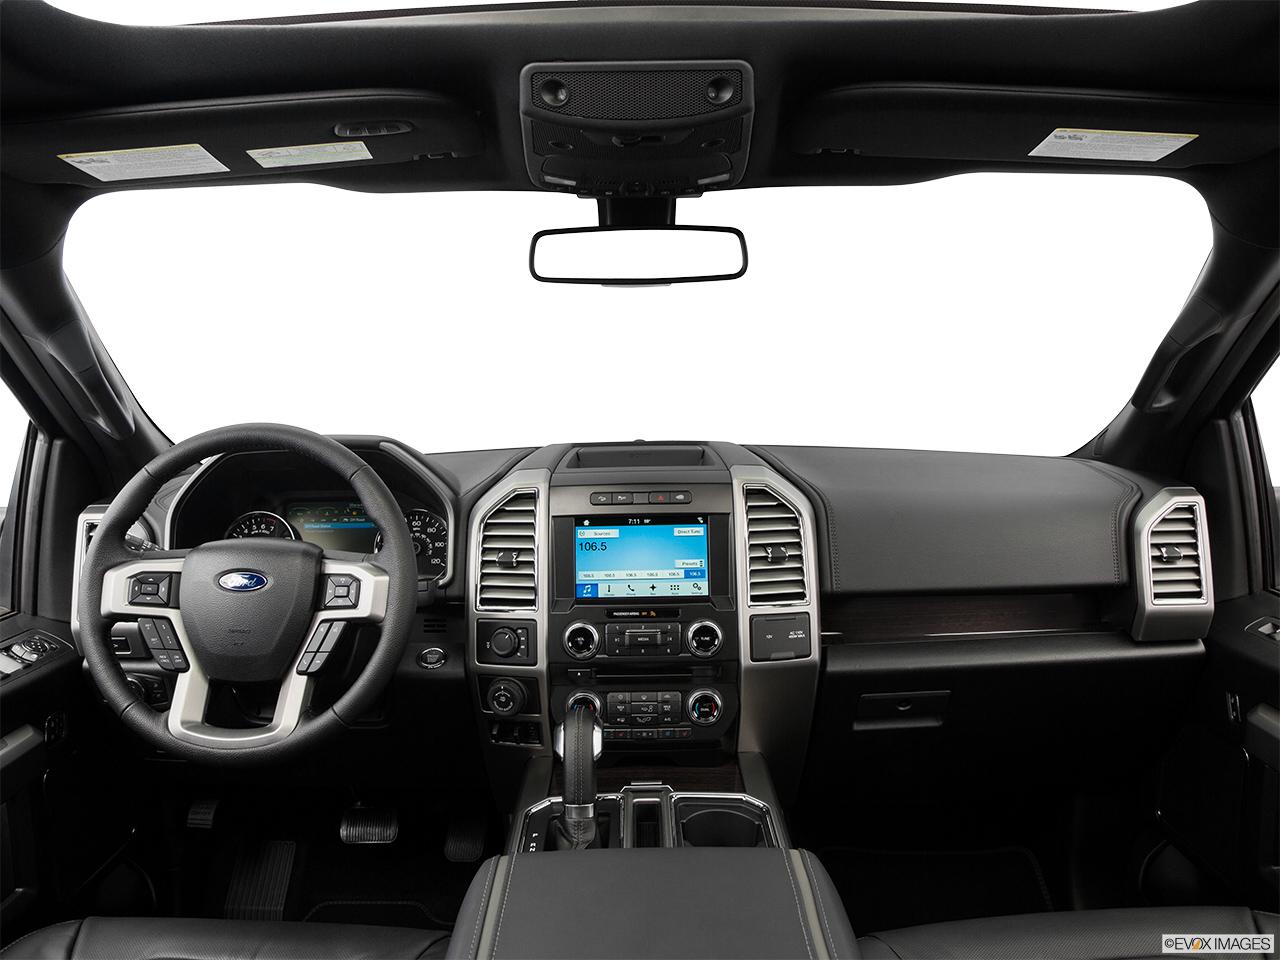 ford f 150 2017 3 5l ecoboost crew cab platinum fx4 luxury pack in uae new car prices specs. Black Bedroom Furniture Sets. Home Design Ideas